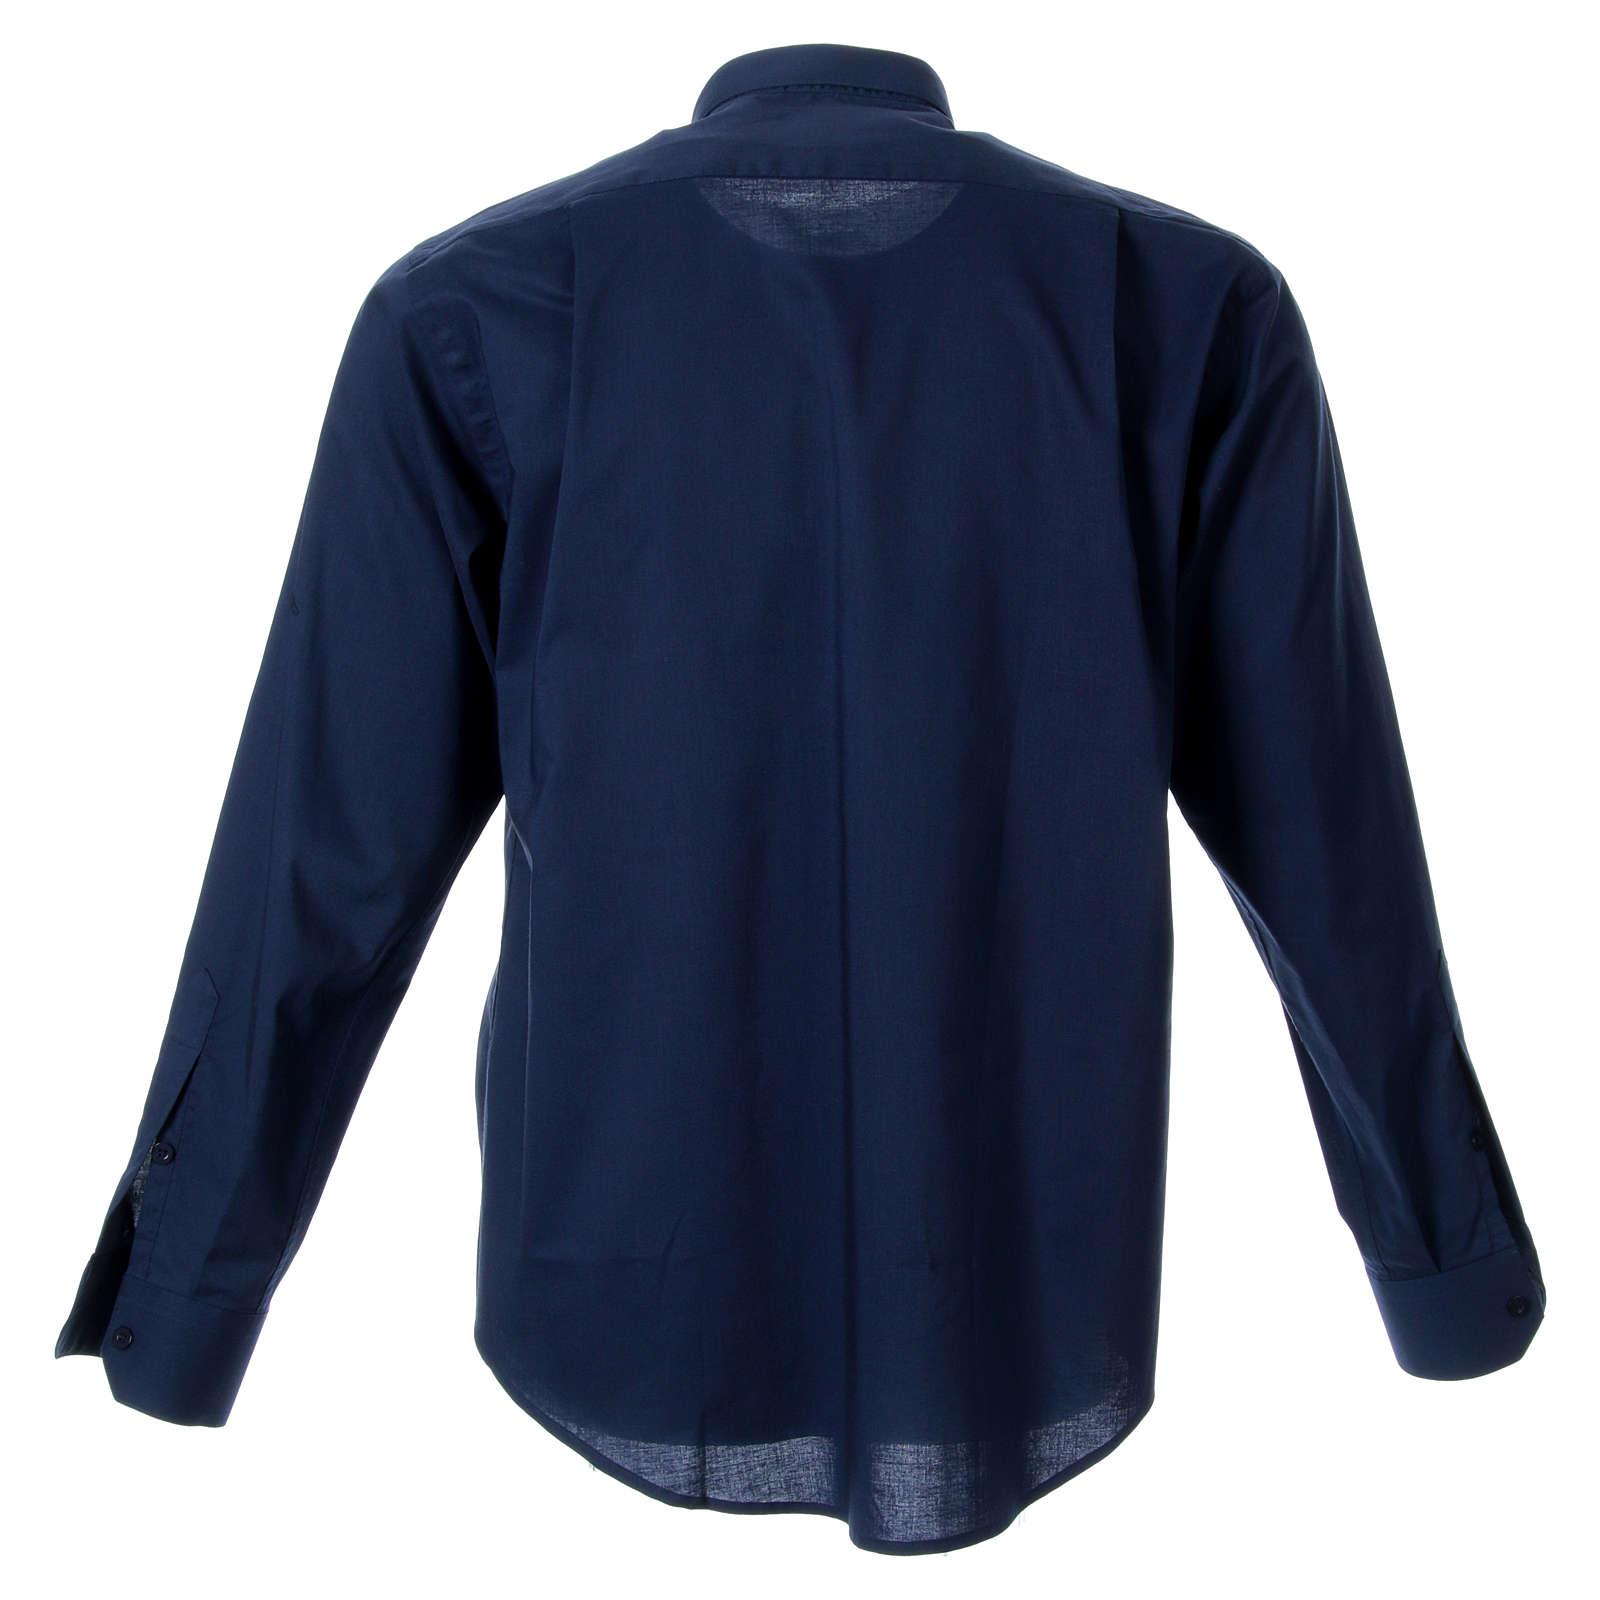 STOCK Camisa de Sacerdote Manga Comprida Misto Azul 4